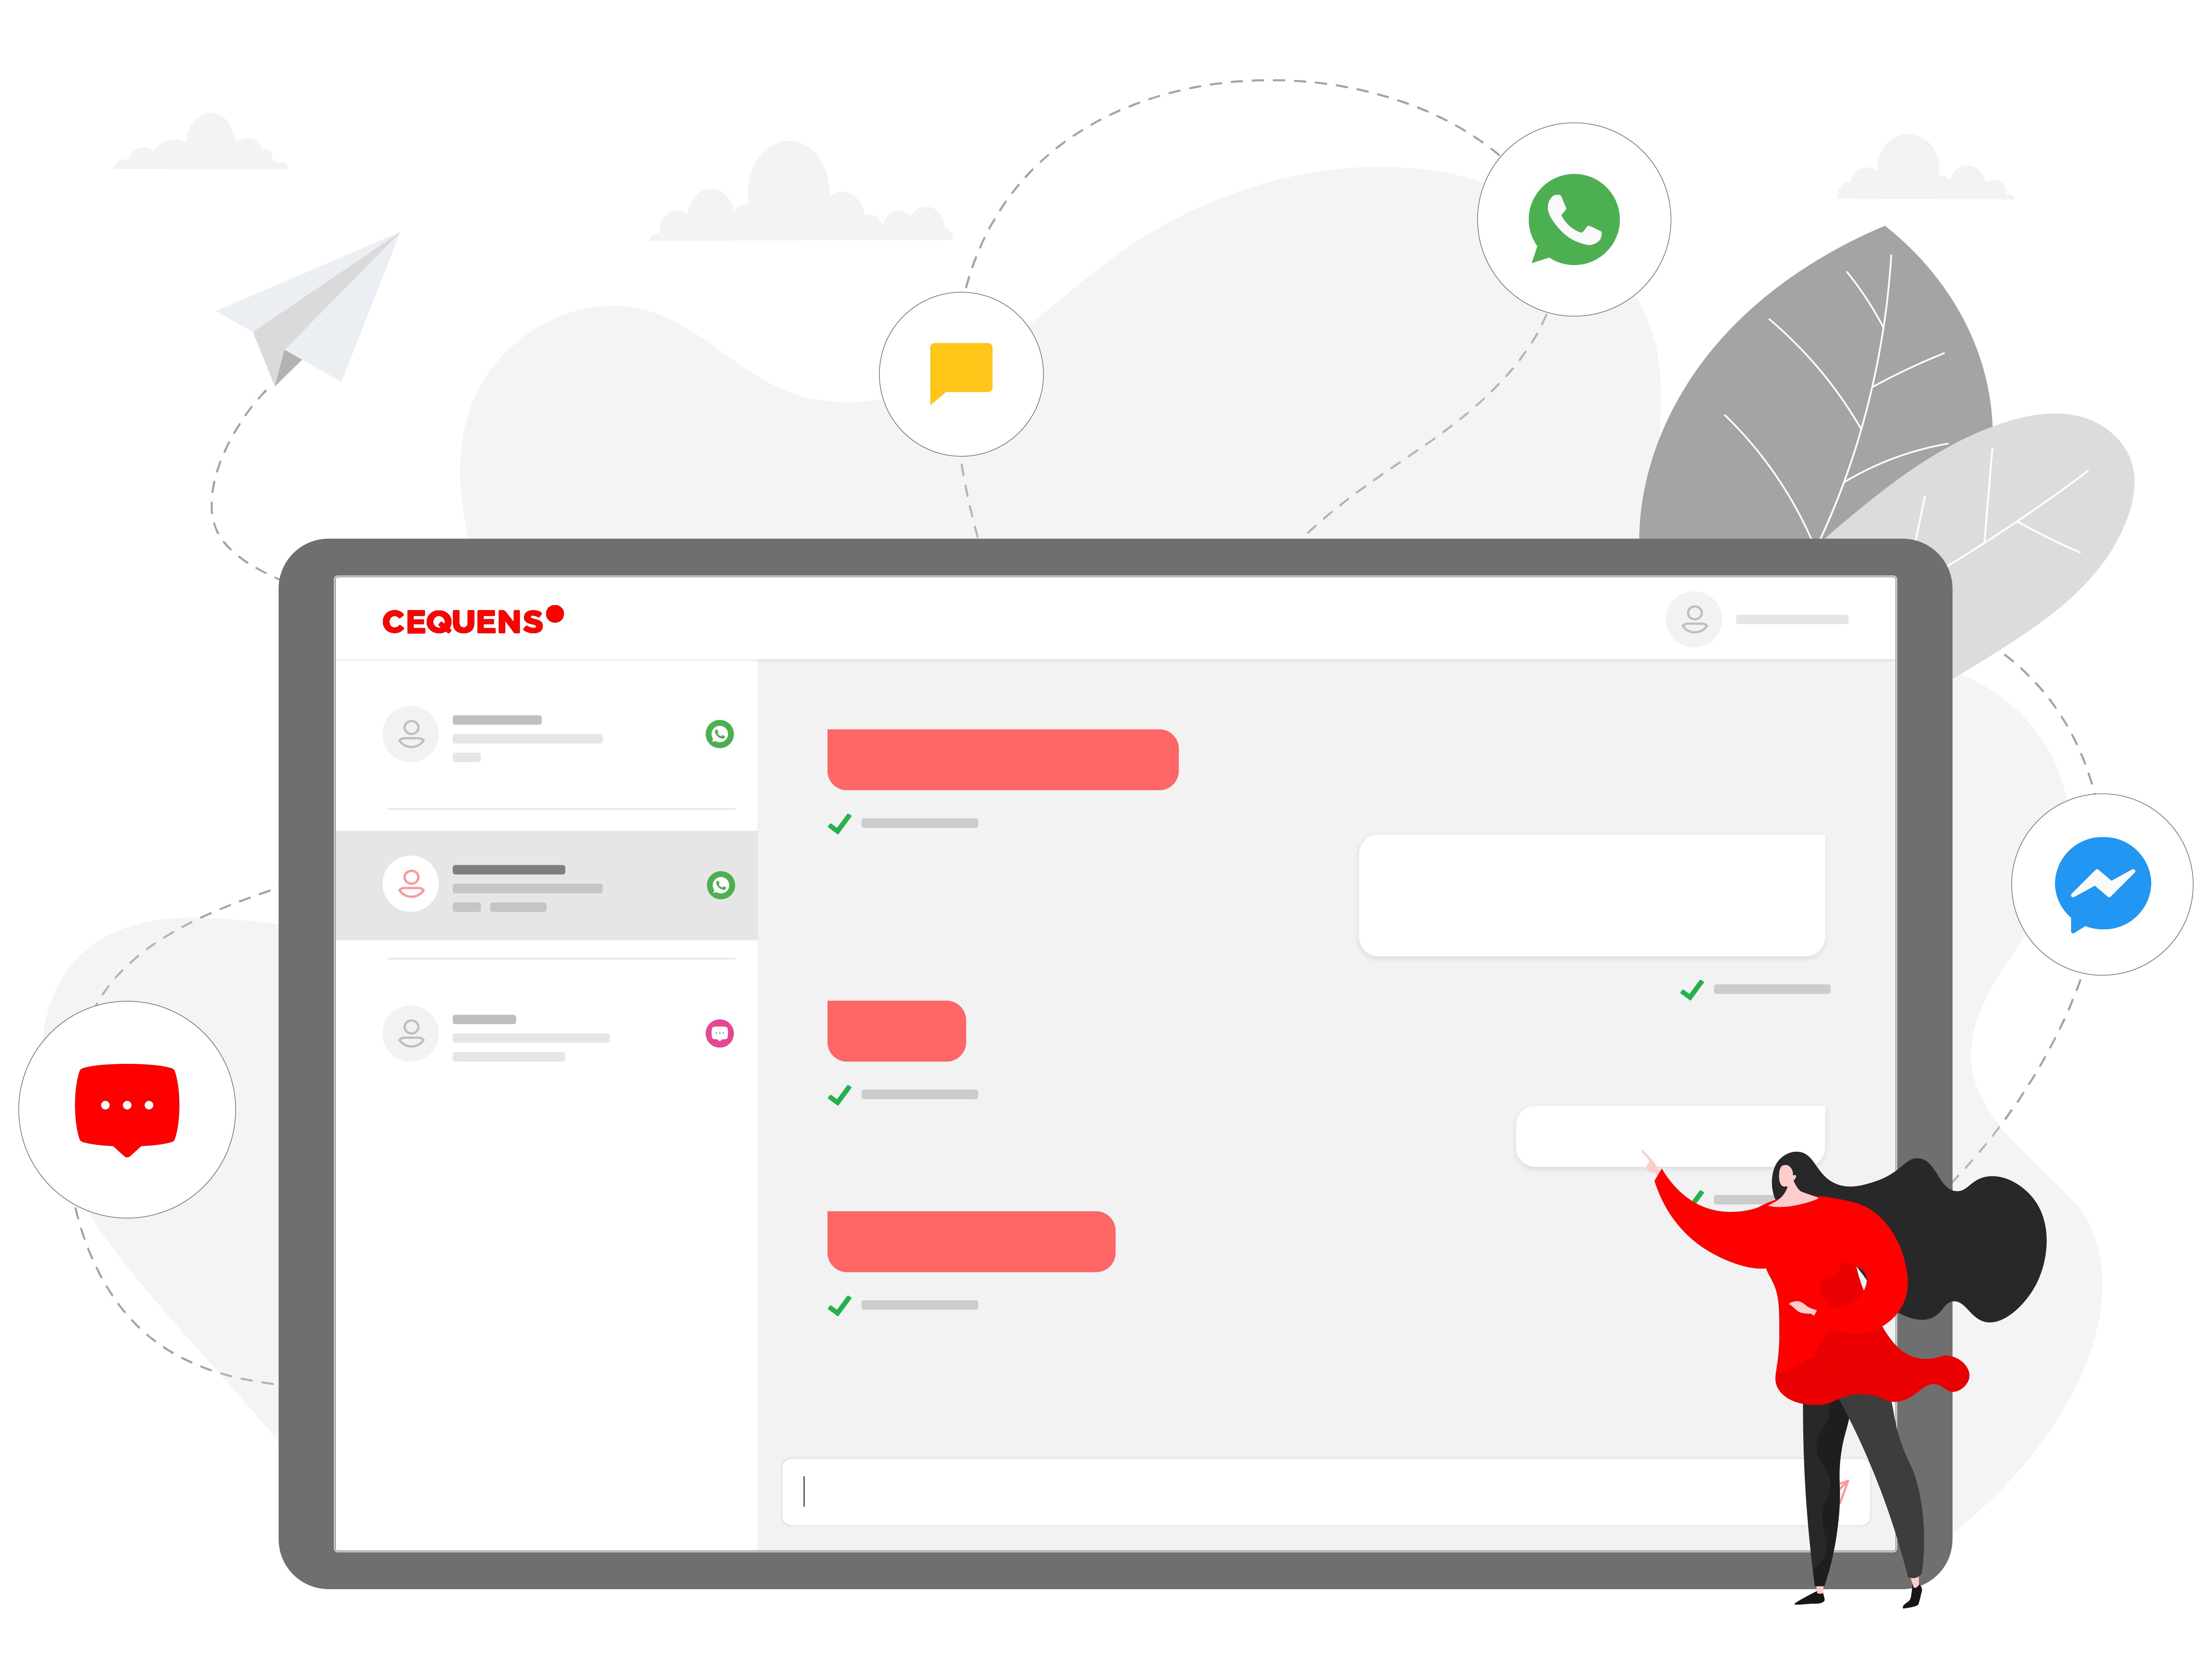 CEQUENS Chat: A Multichannel Conversational Platform for the Future